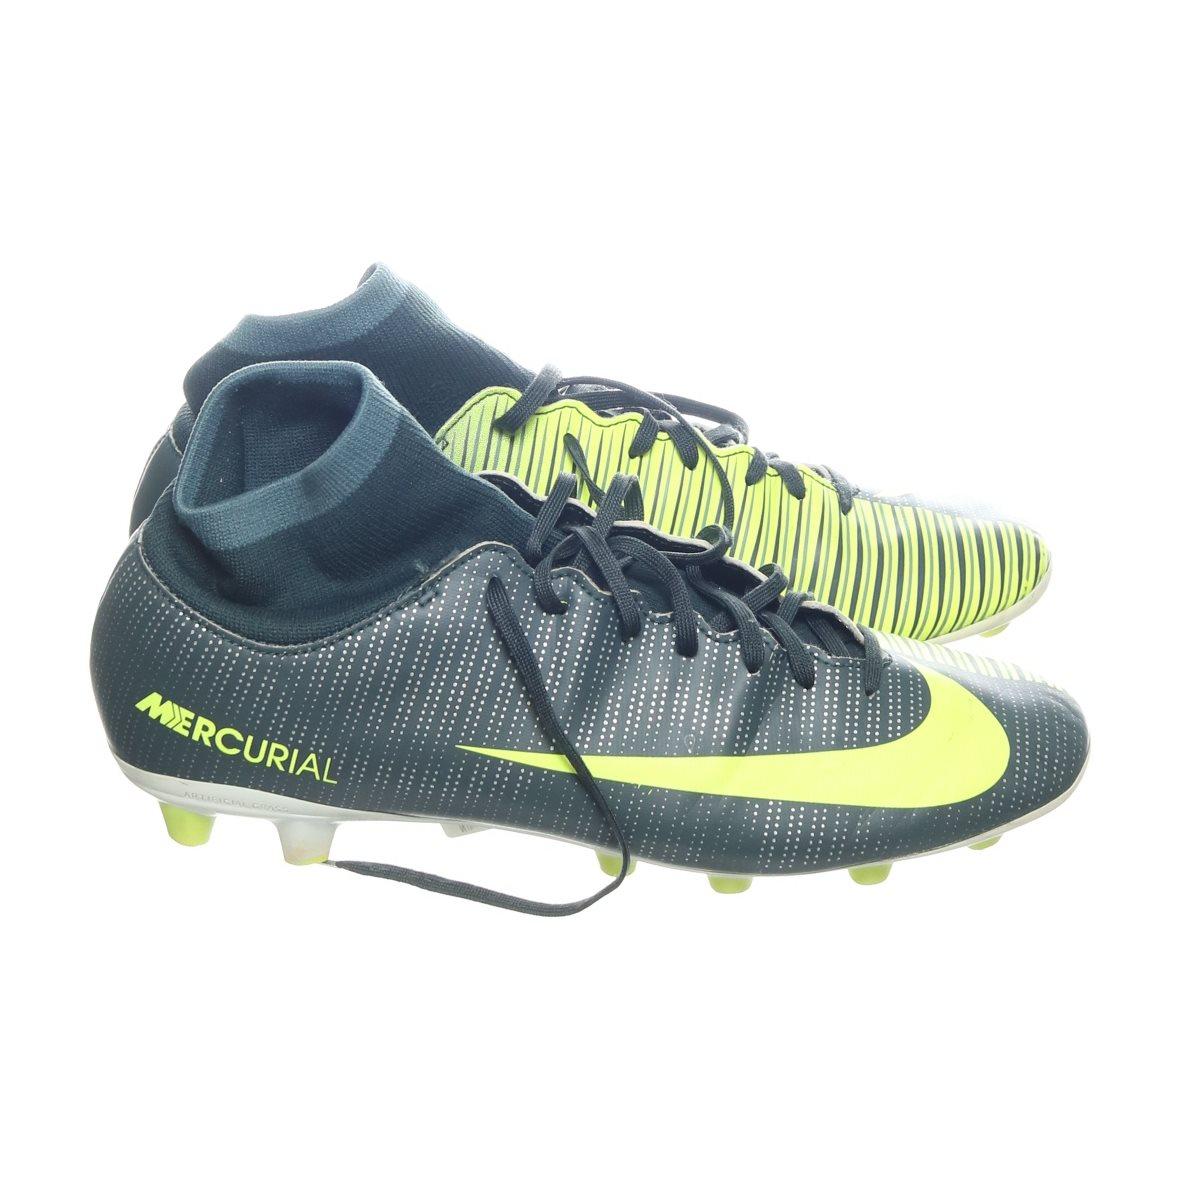 premium selection 4c2e9 29d11 Nike, Fotbollsskor konstgräs, Strl  42, CR7 Mercurial, Gul Grå